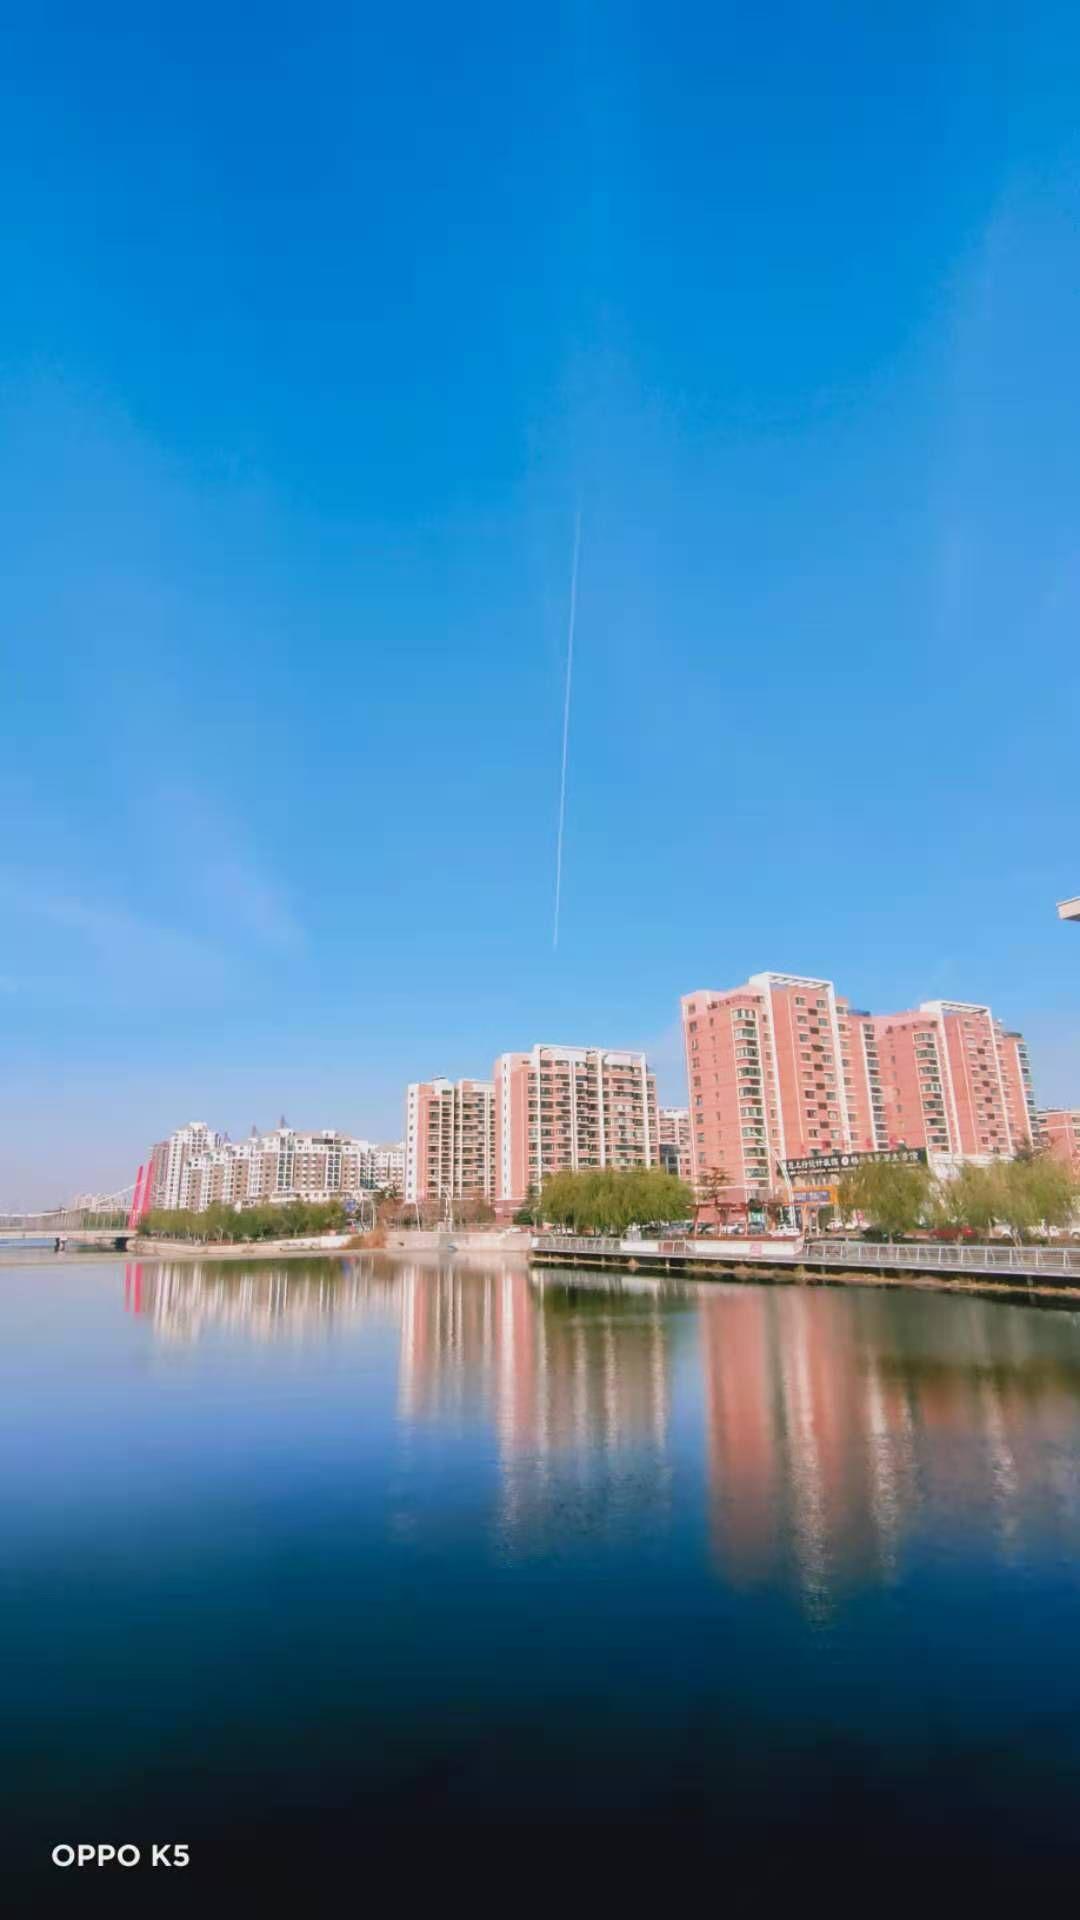 Kuixing Park